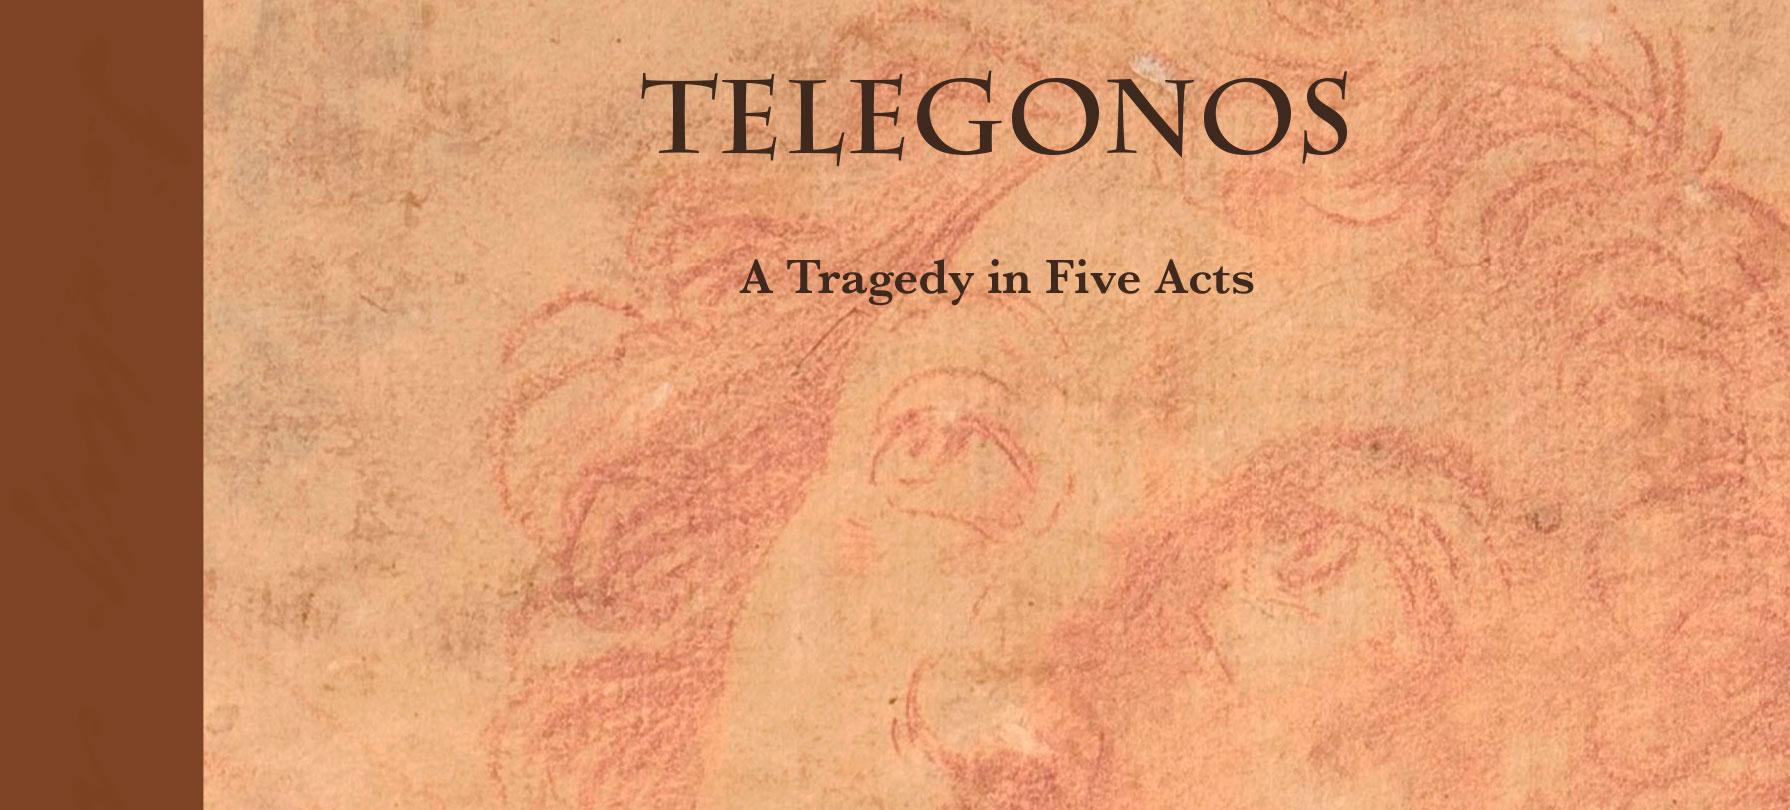 Telegonos-banner